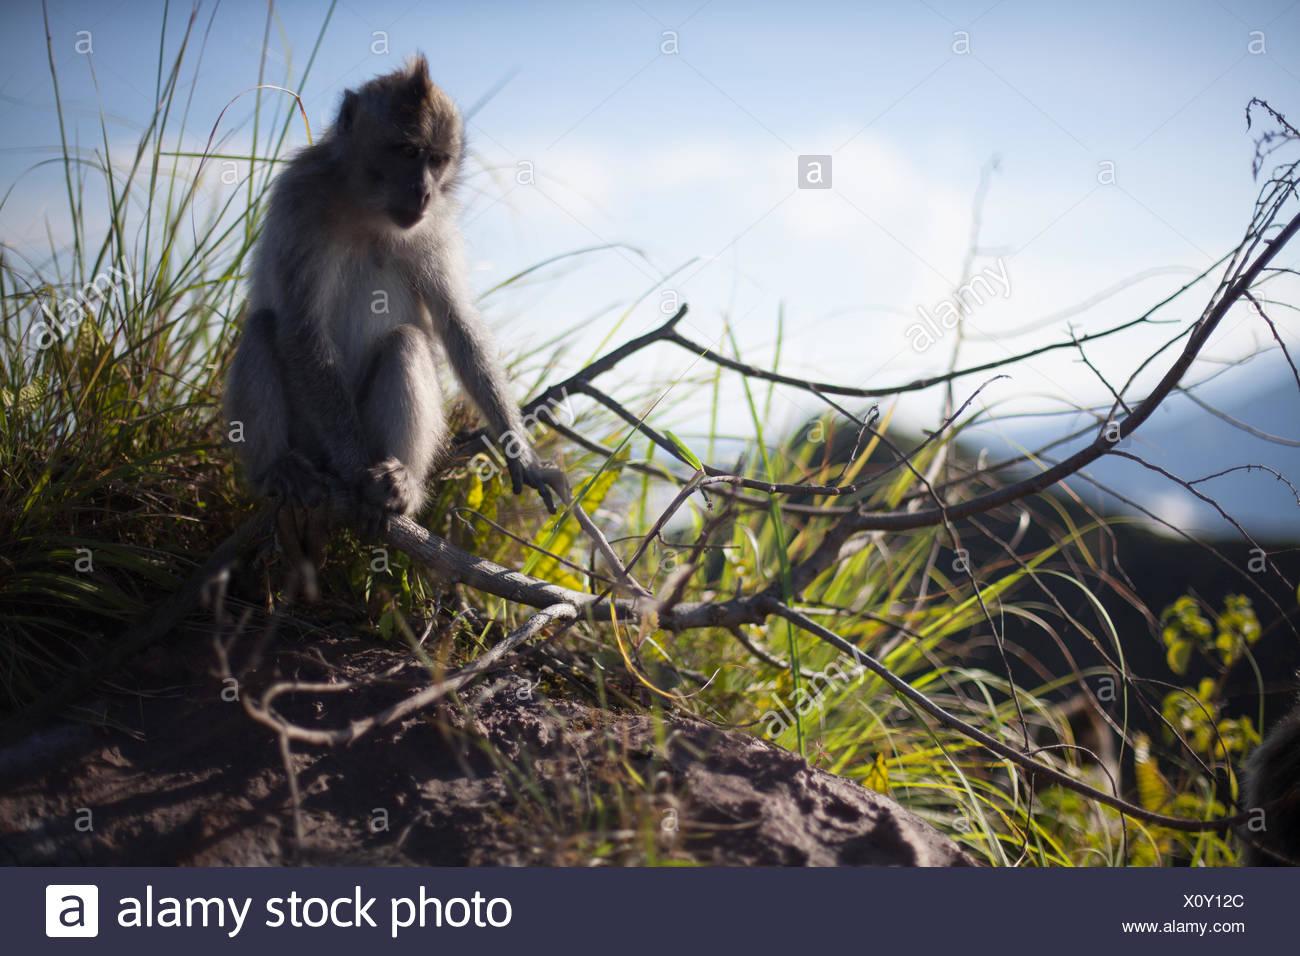 Monkey Grabbing Branch - Stock Image